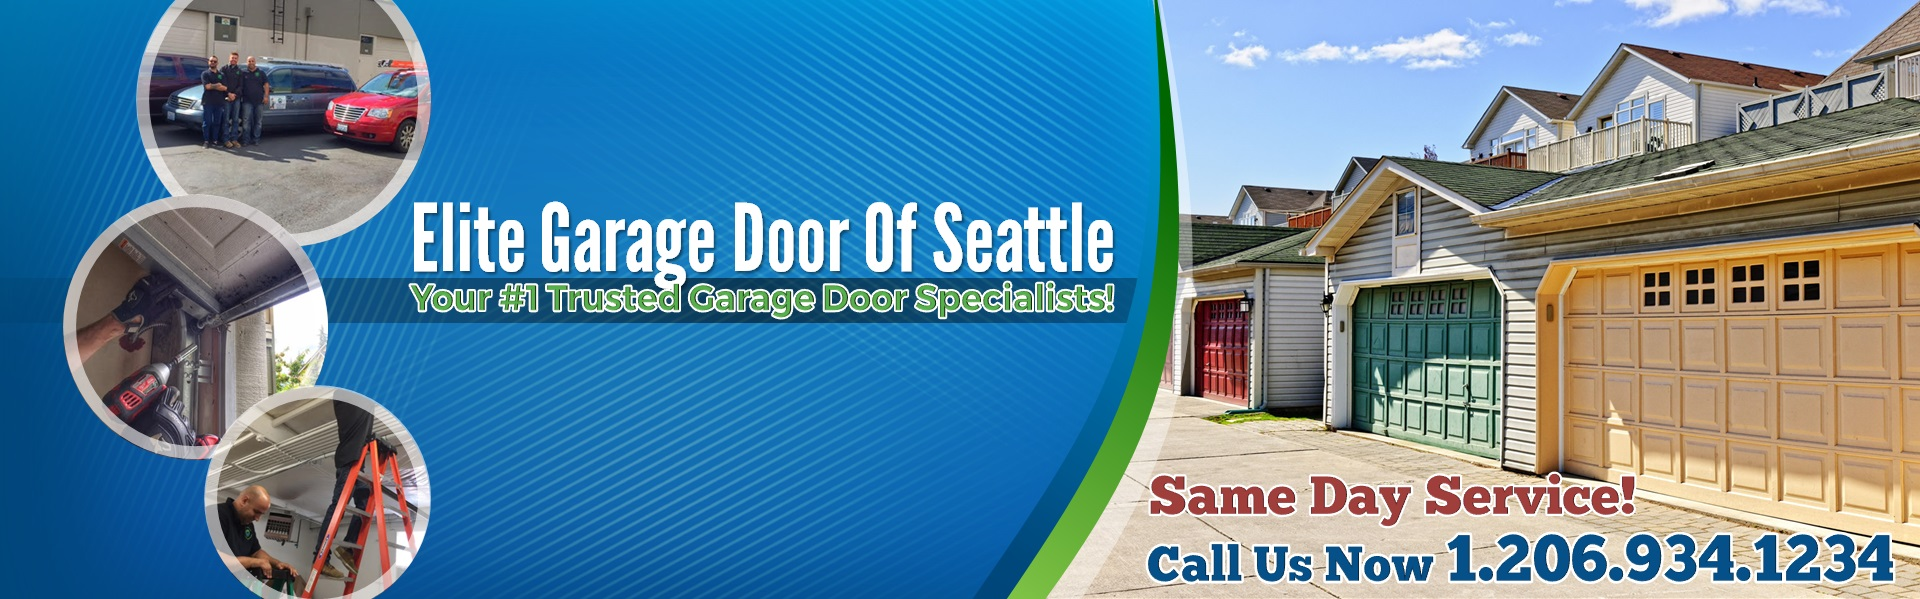 Garage Door Questions & Answers • Elite Tech Services, LLC